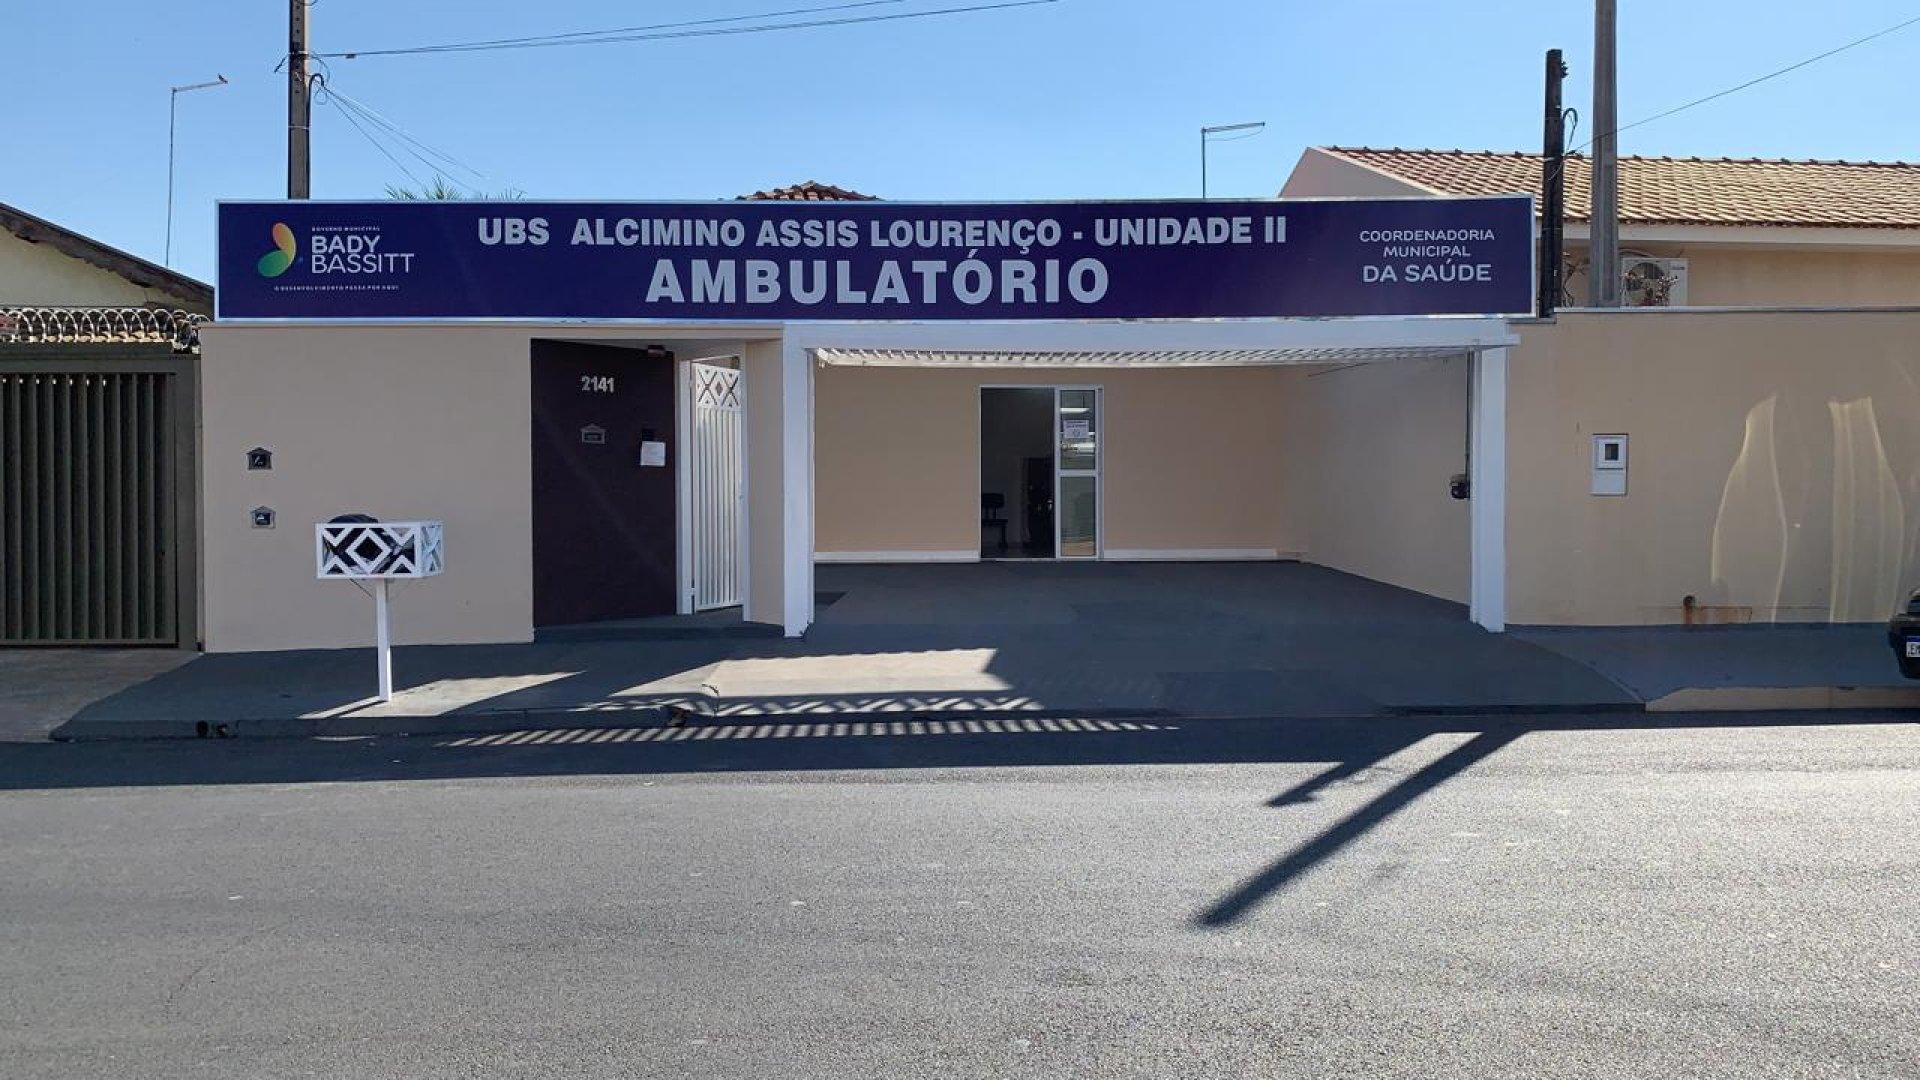 SAÚDE - Bady passa a ter prédio para atendimento exclusivo de especialidades médicas